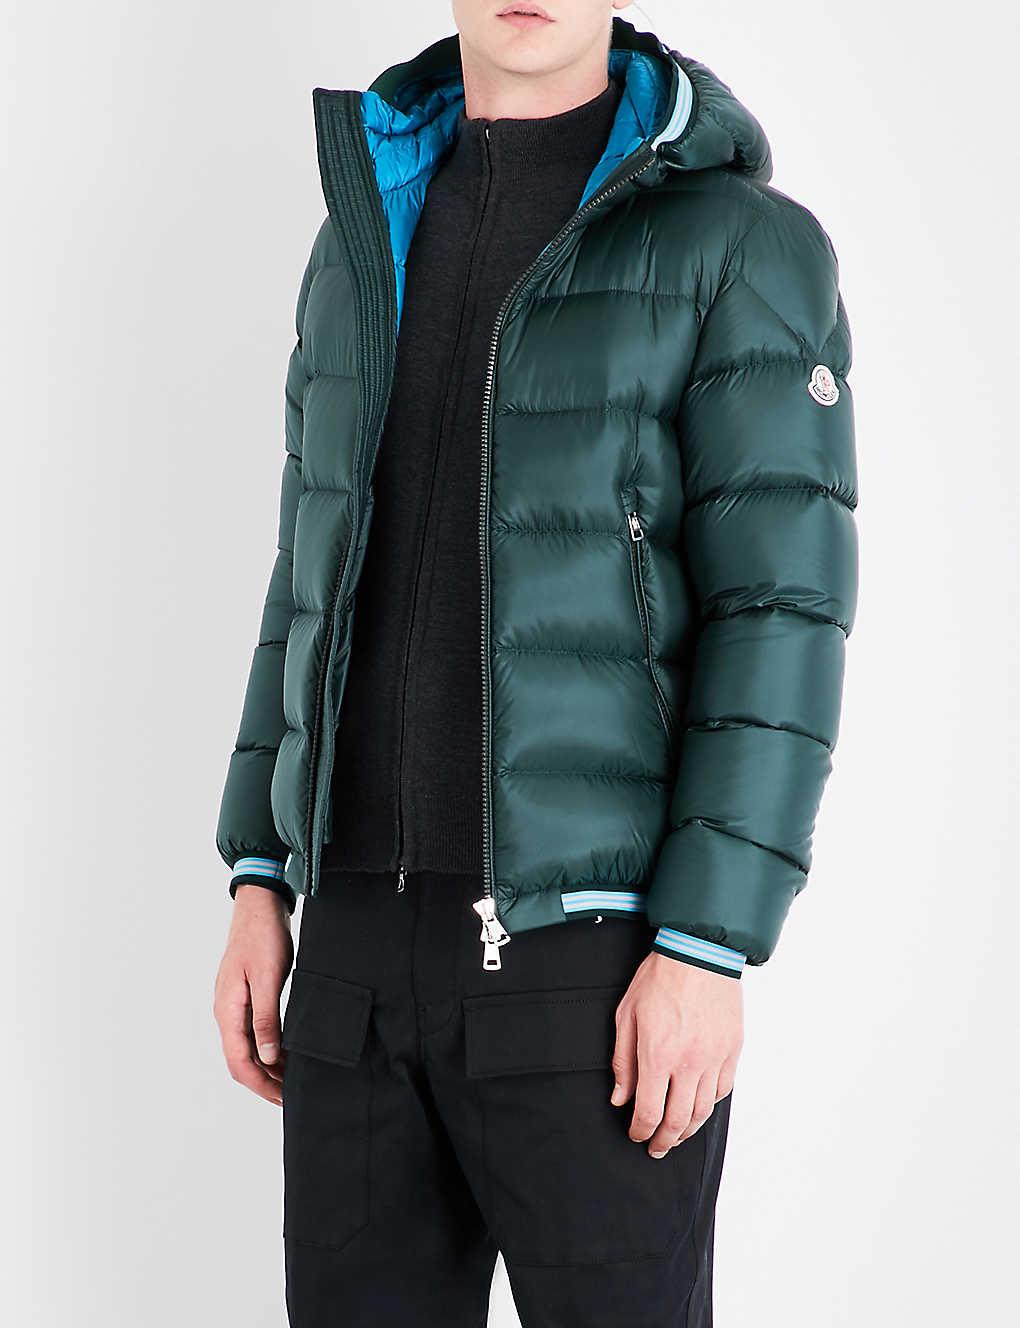 moncler jacket with fur hood